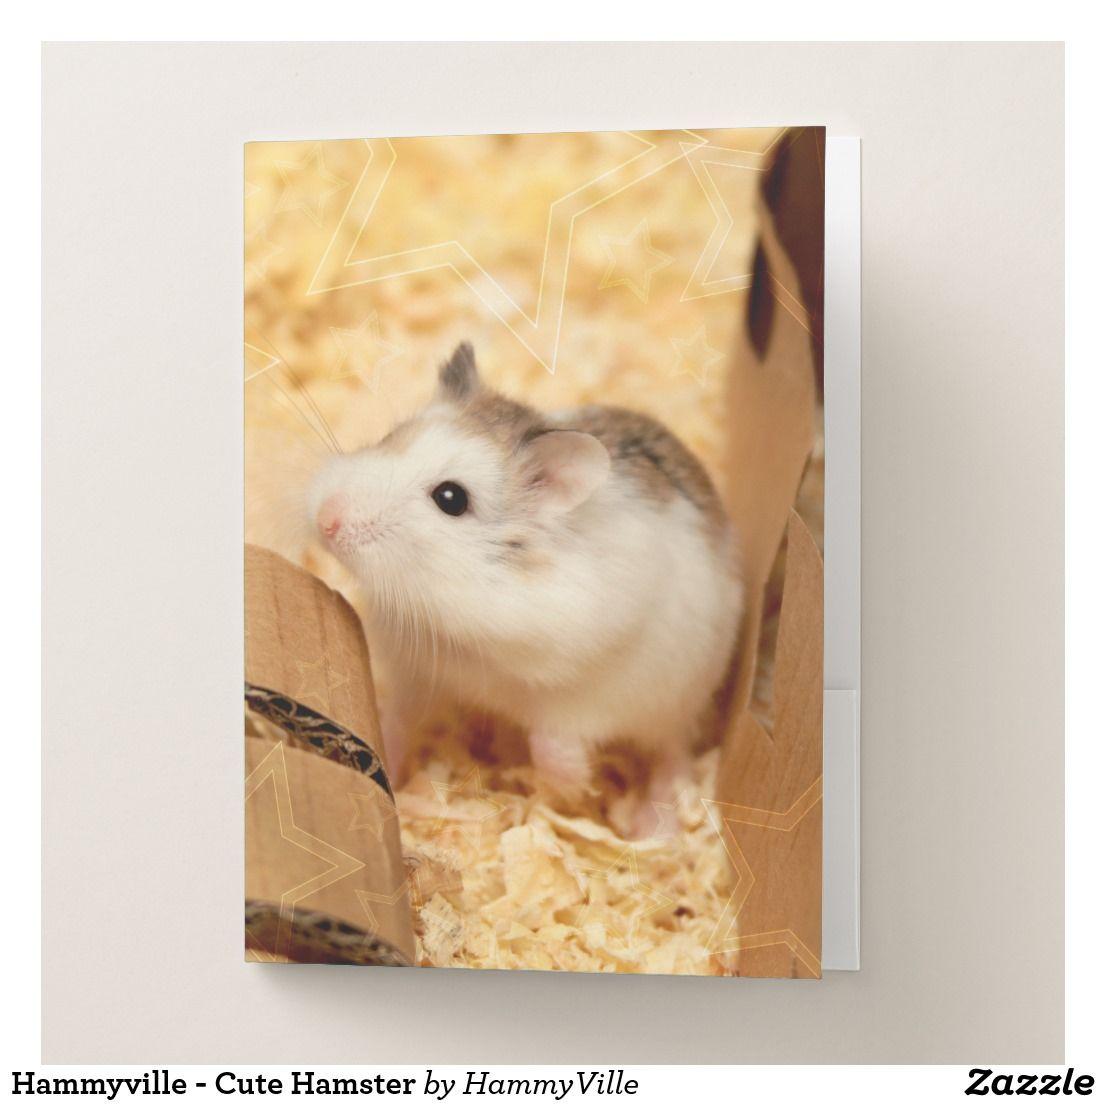 Hammyville Cute Hamster Pocket Folder Zazzle Com Cute Hamsters Hamster Cute Animals